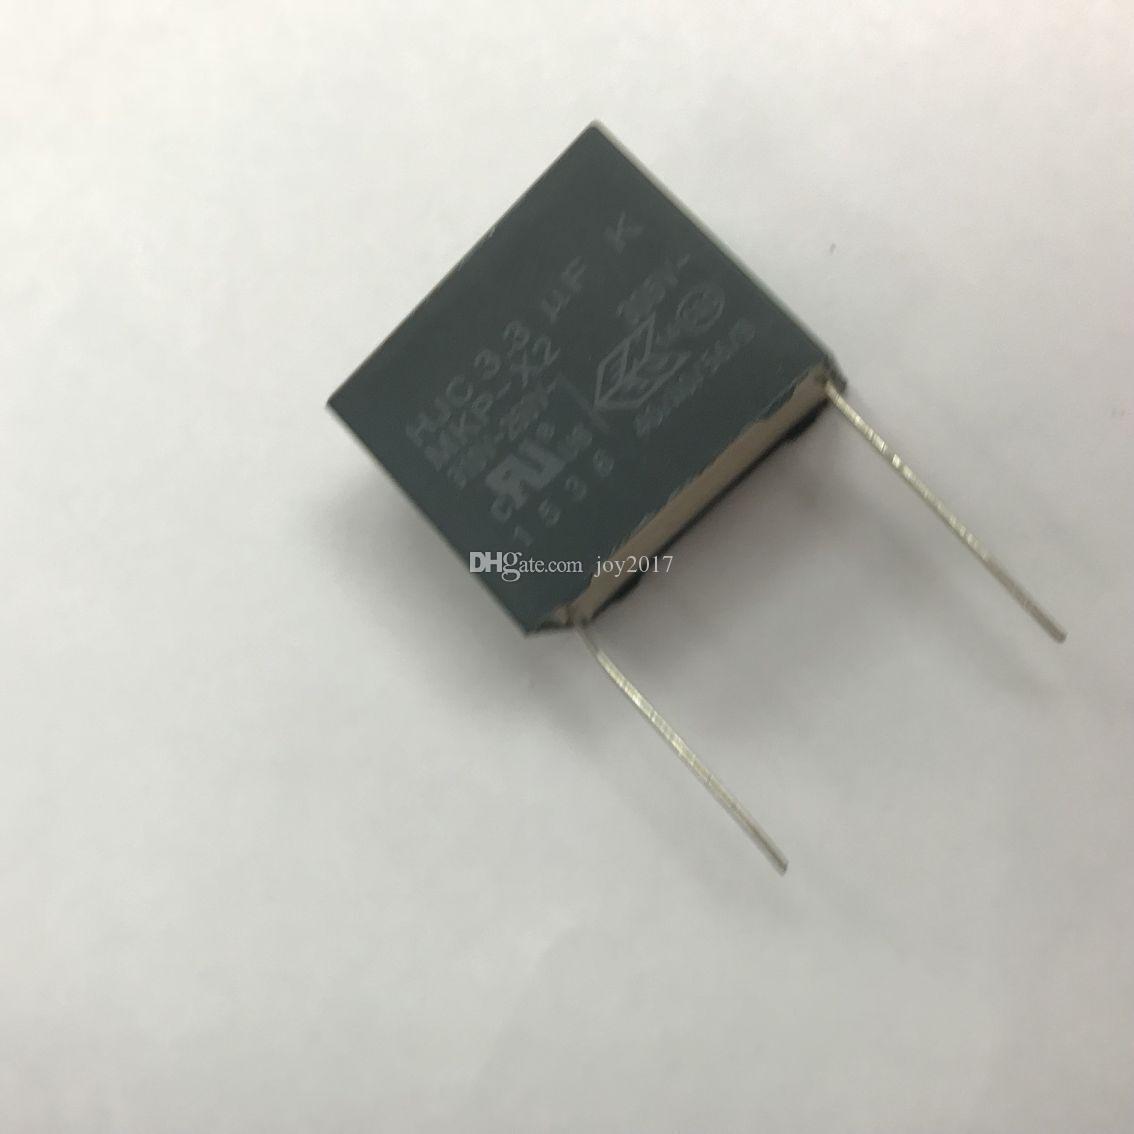 Freies shipping3.3UF 275 V AC X2 275 VAC335K 305 V 27 MM HJC3. 3UF olypropylen film kondensator X2 kondensator 10 TEILE / LOS